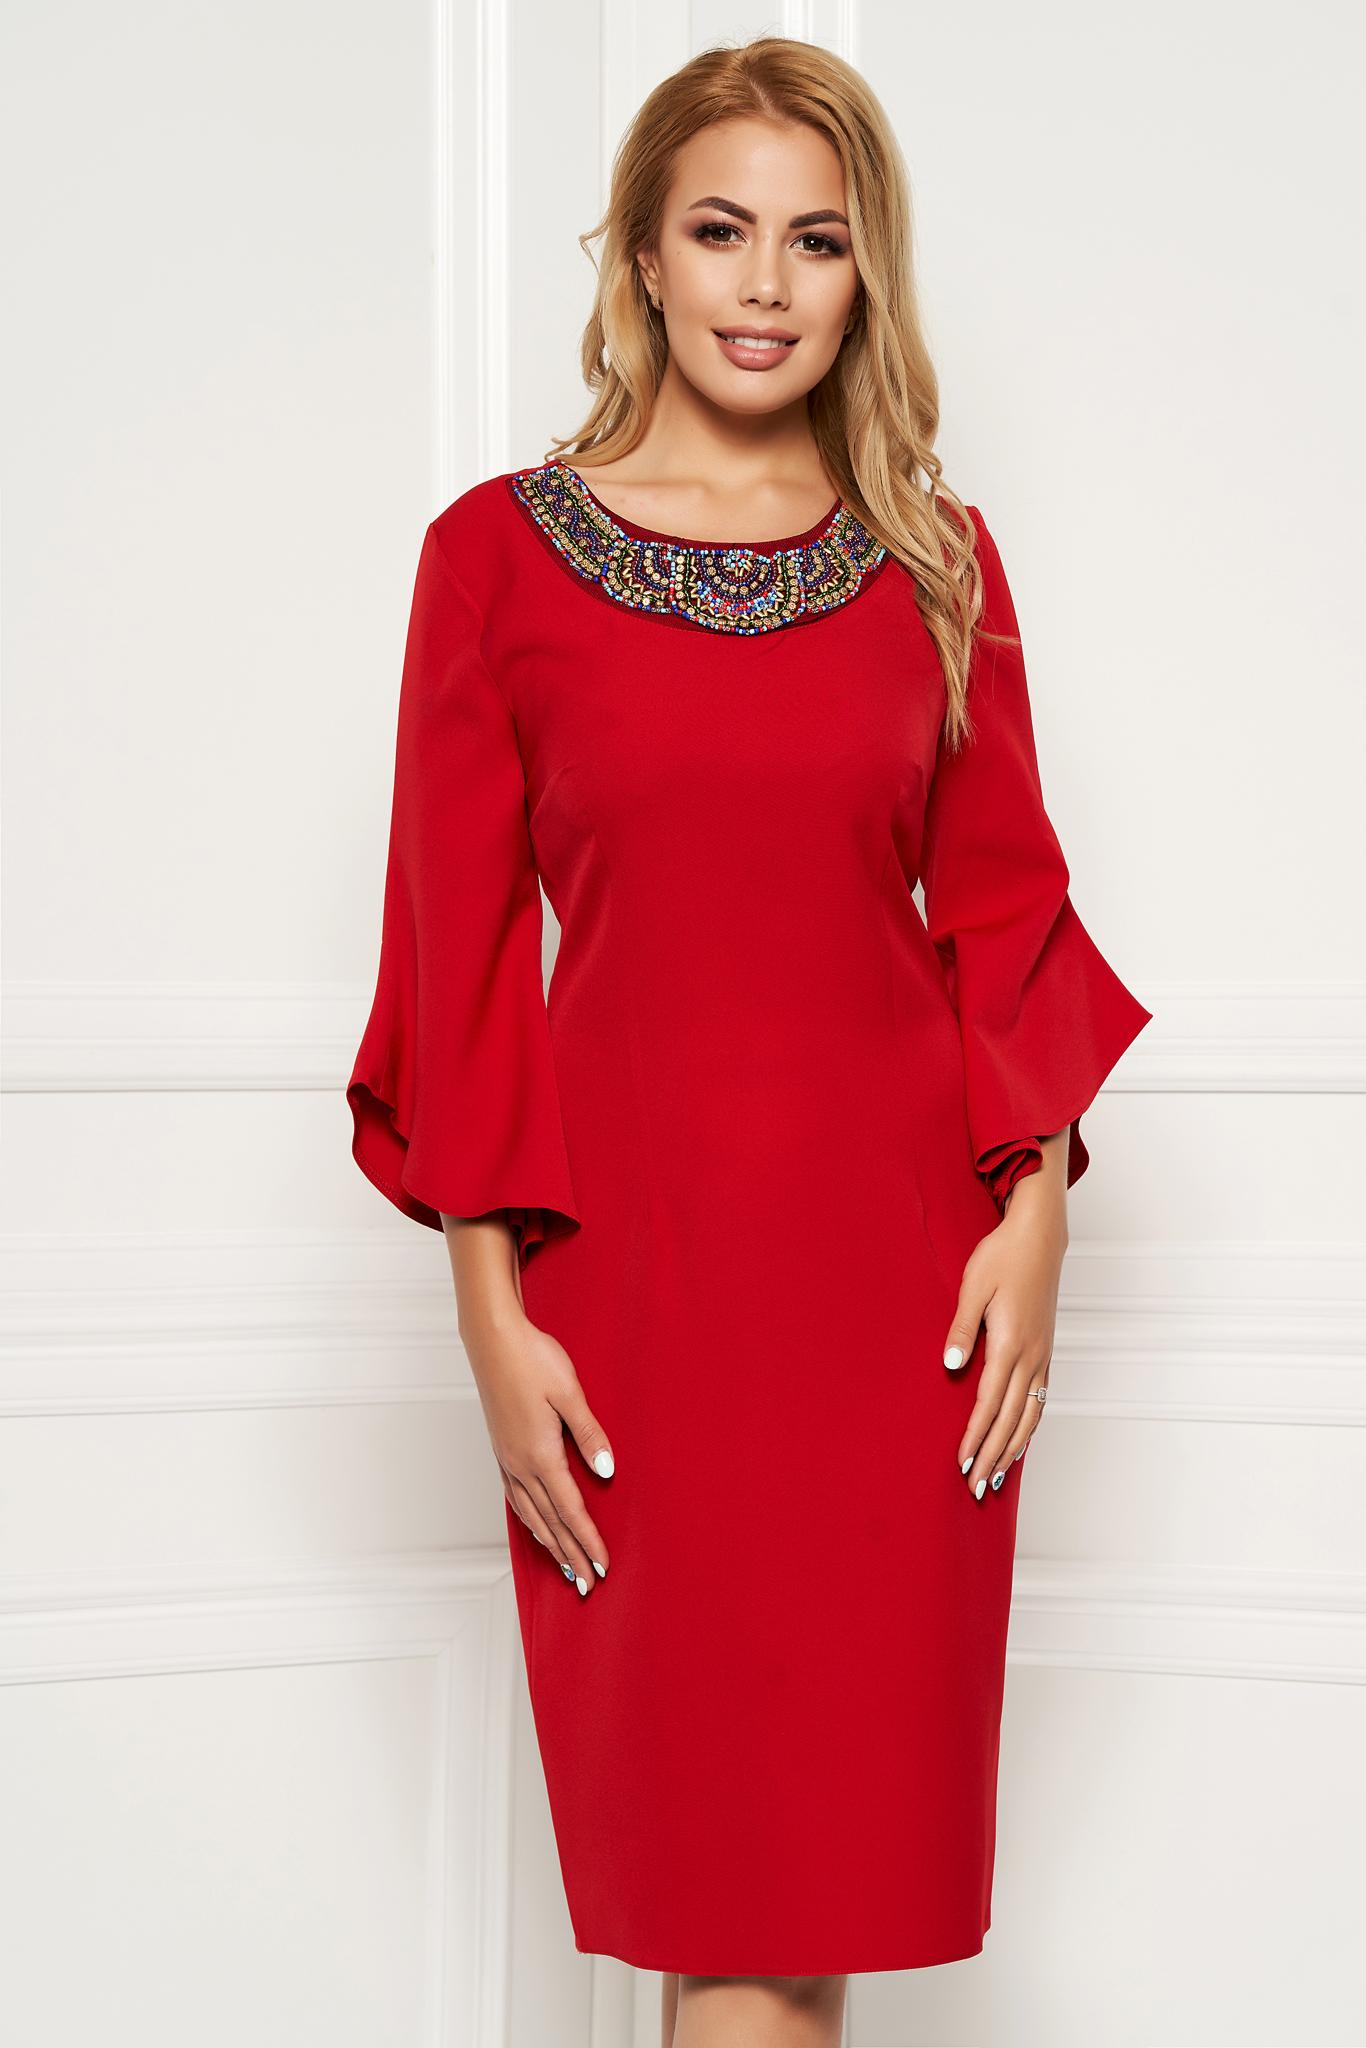 Rochie rosie eleganta tip creion din stofa subtire usor elastica cu maneci trei-sferturi cu aplicatii cu margele